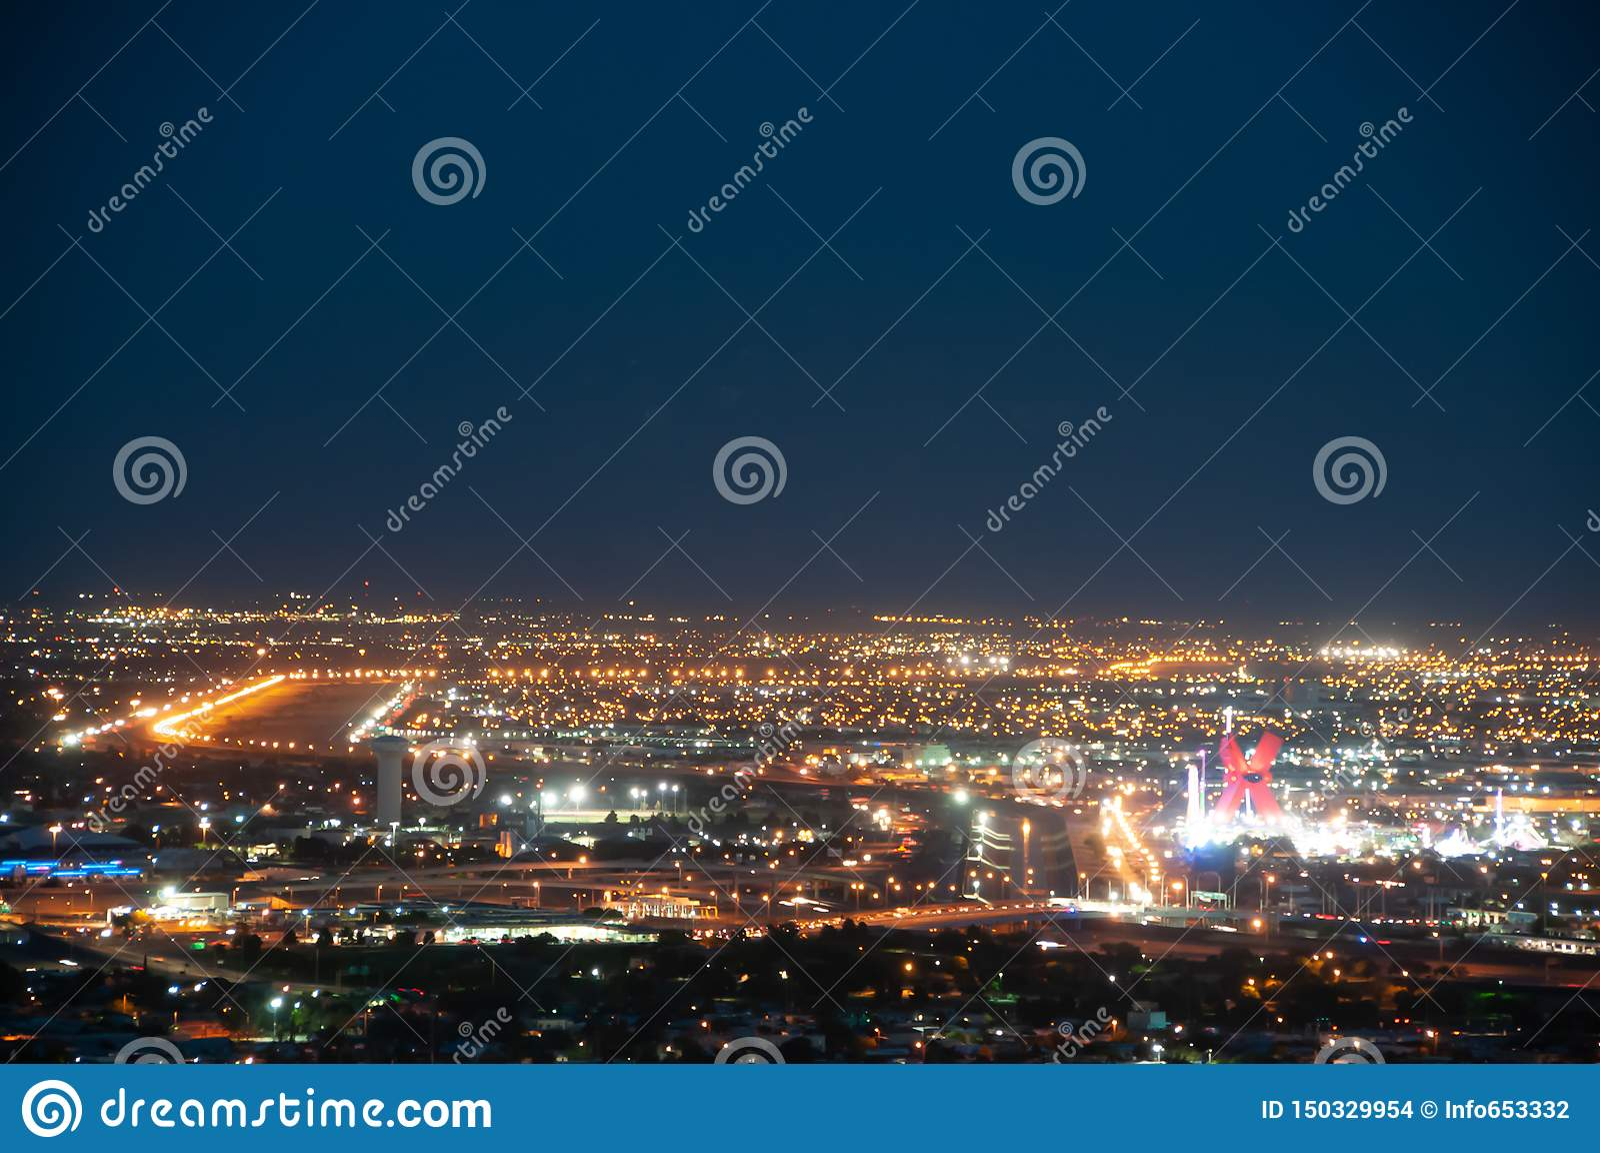 De Grens van de V.S./van Mexico, El Paso, TX/Juarez Chichuahua bij nacht